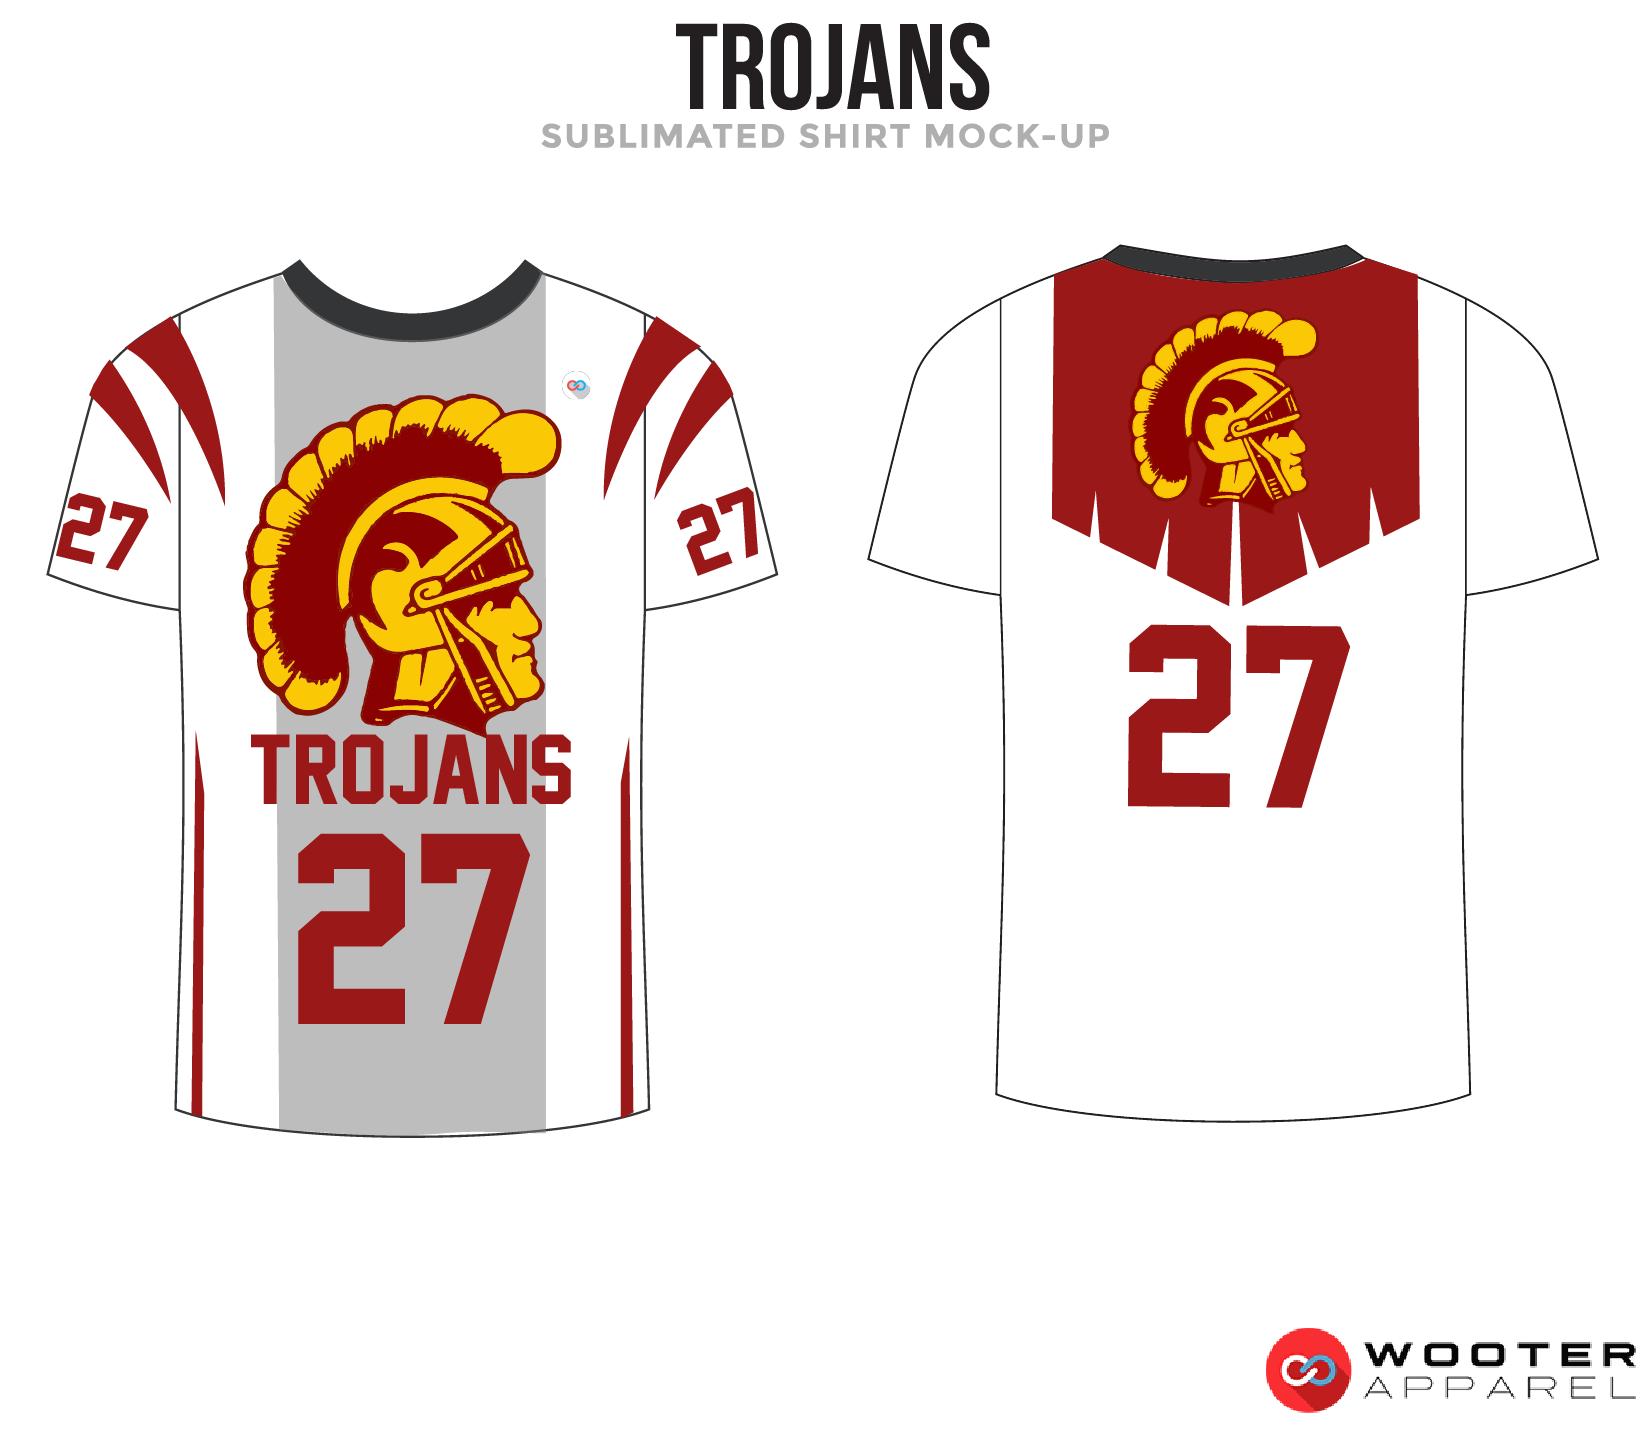 TROJANS White Yellow Black and Maroon Premium Shooting Shirt